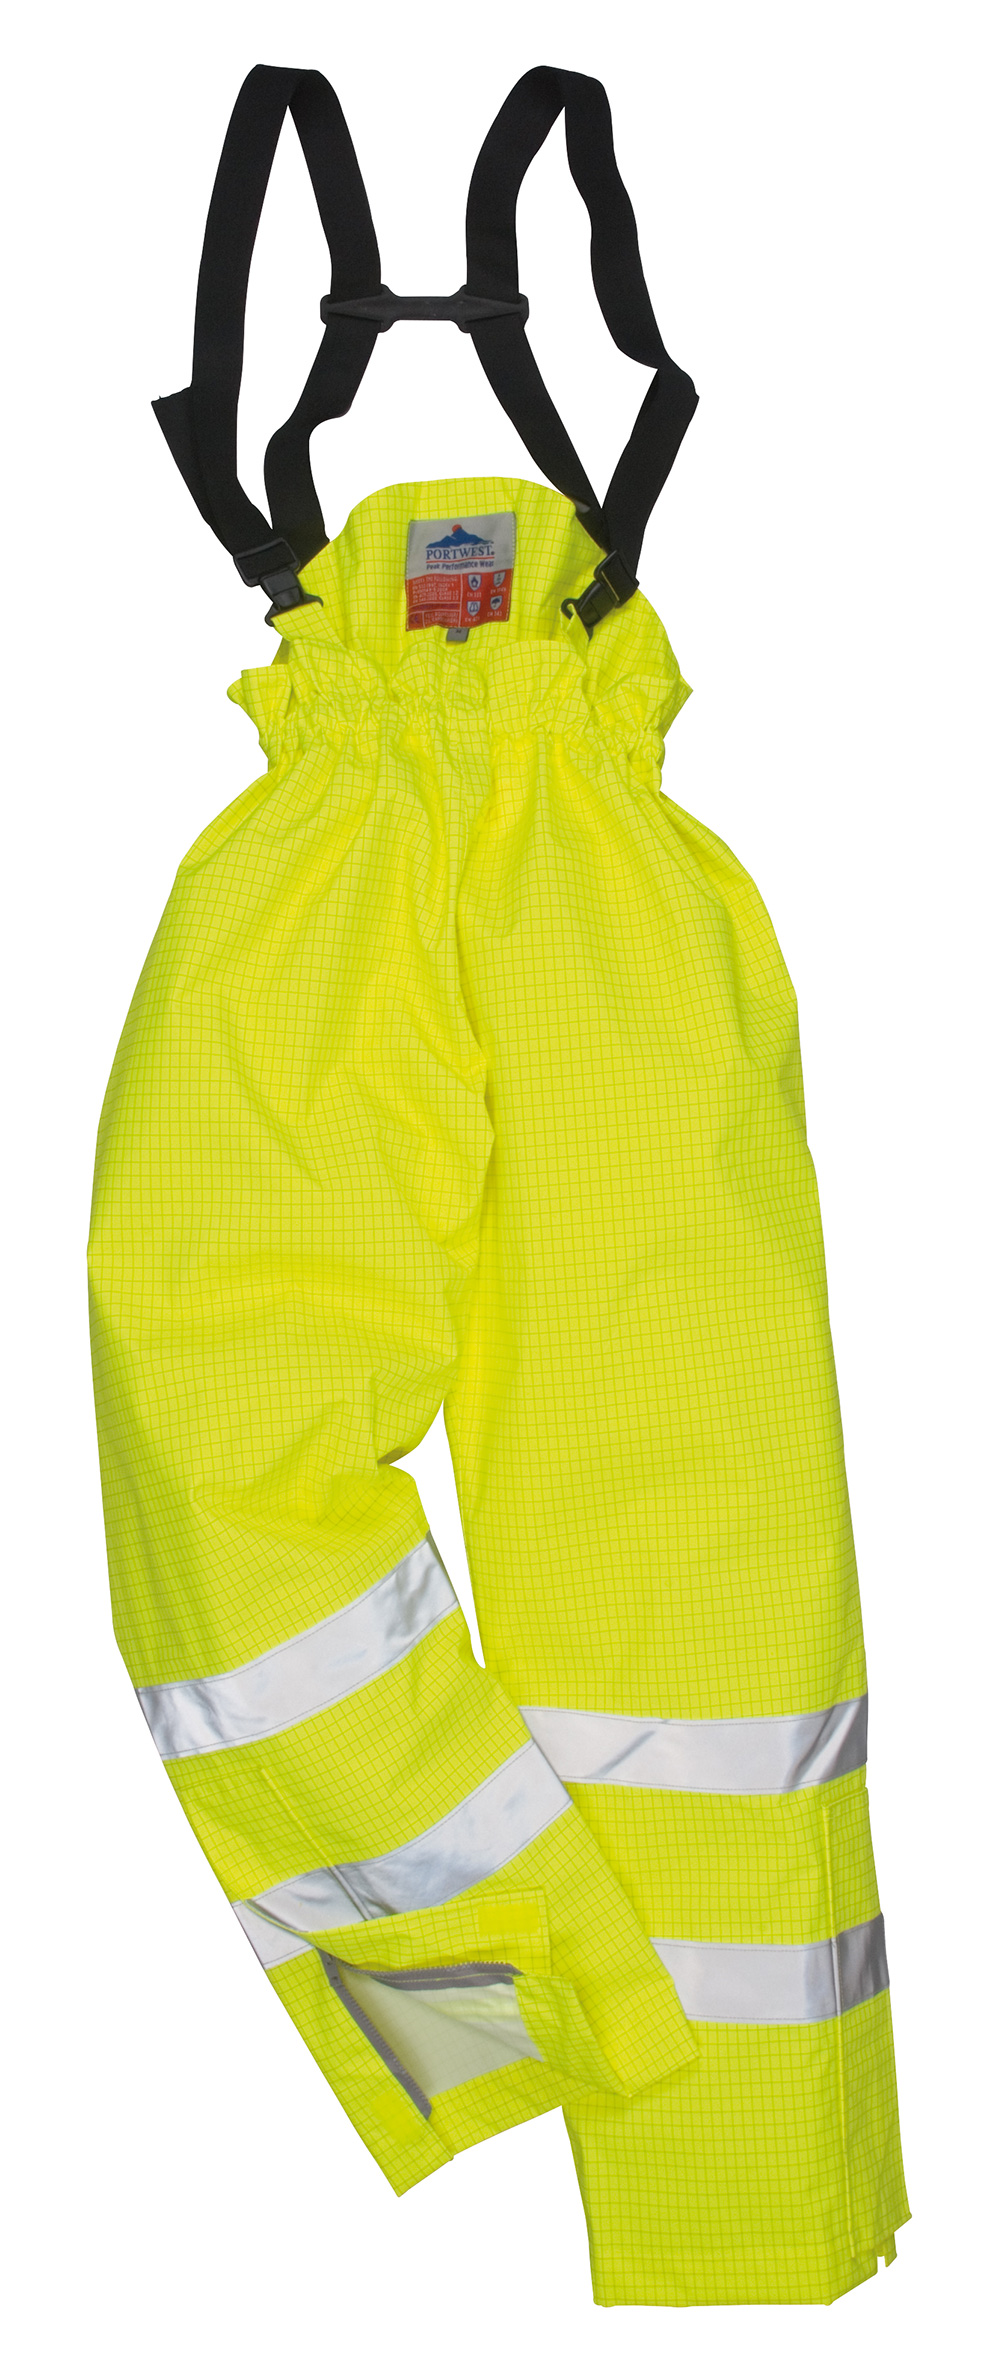 5e62b59870da Northrock Safety   Bizflame Rain Unlined - Hi-Vis Antistatic FR ...